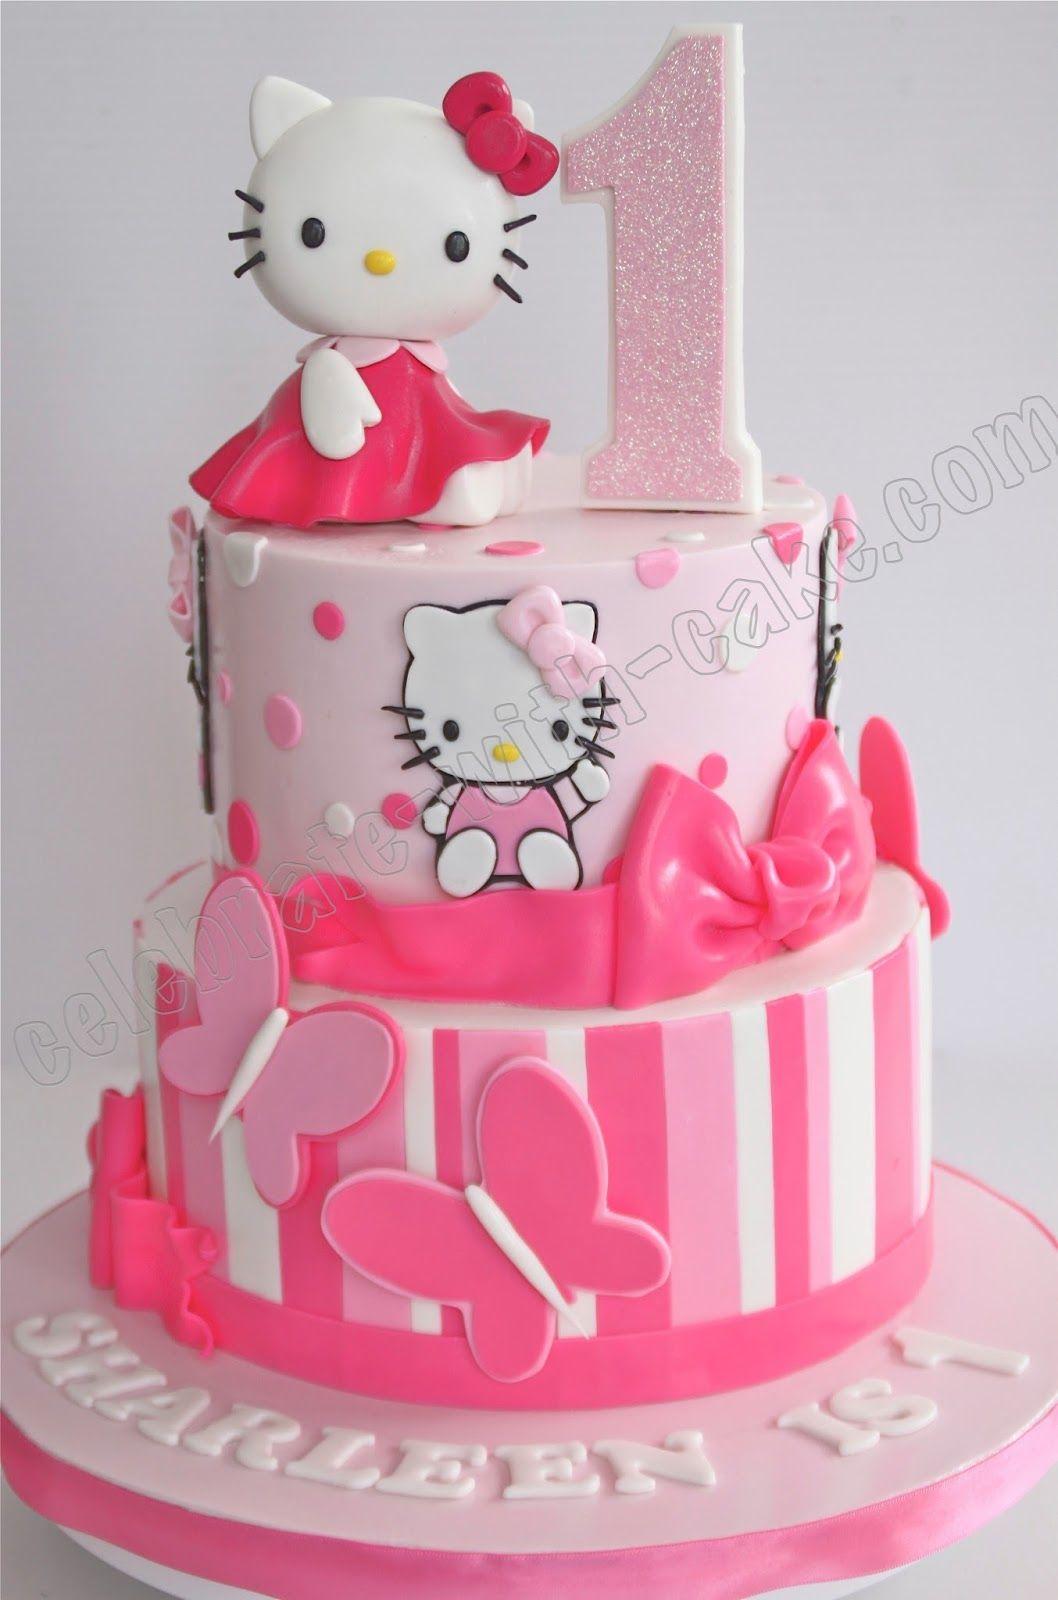 Celebrate With Cake 1st Birthday Hello Kitty Tier Cake